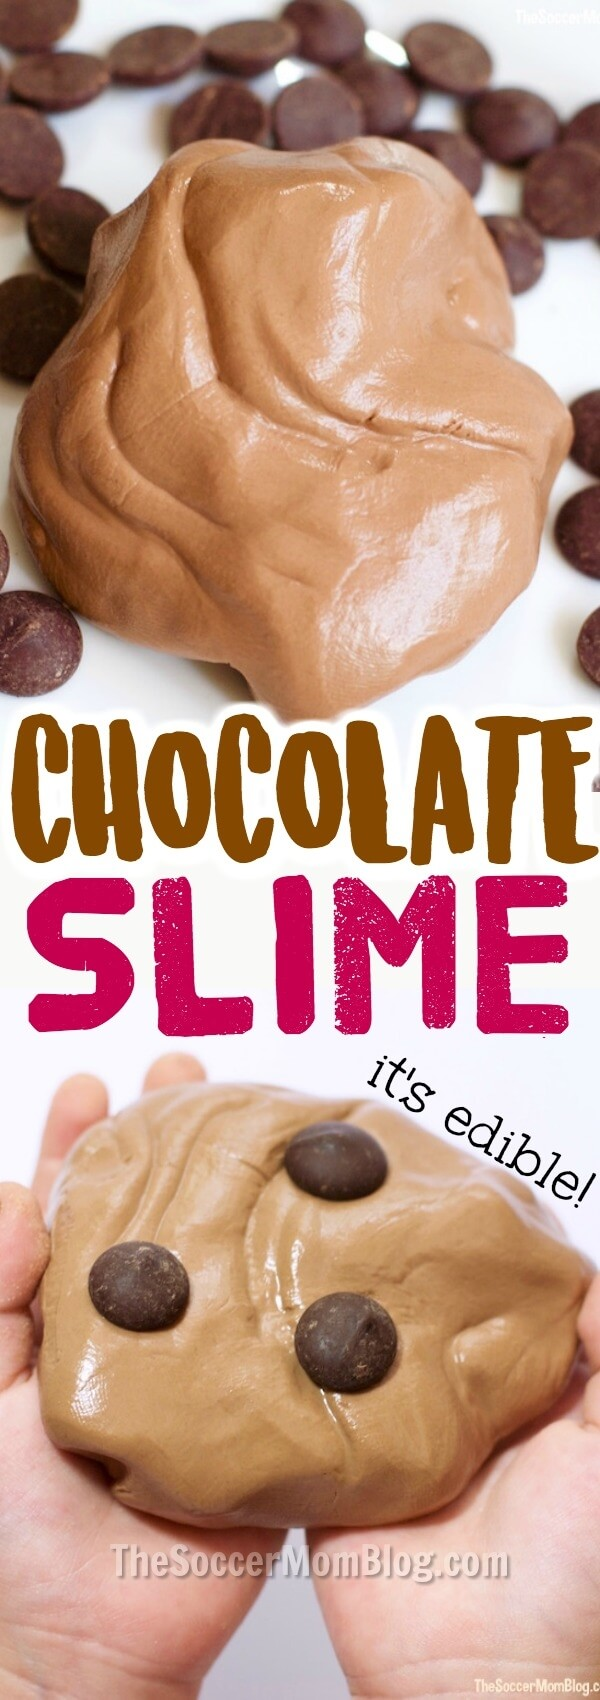 3 Ingredient Edible Chocolate Slime Recipe Video